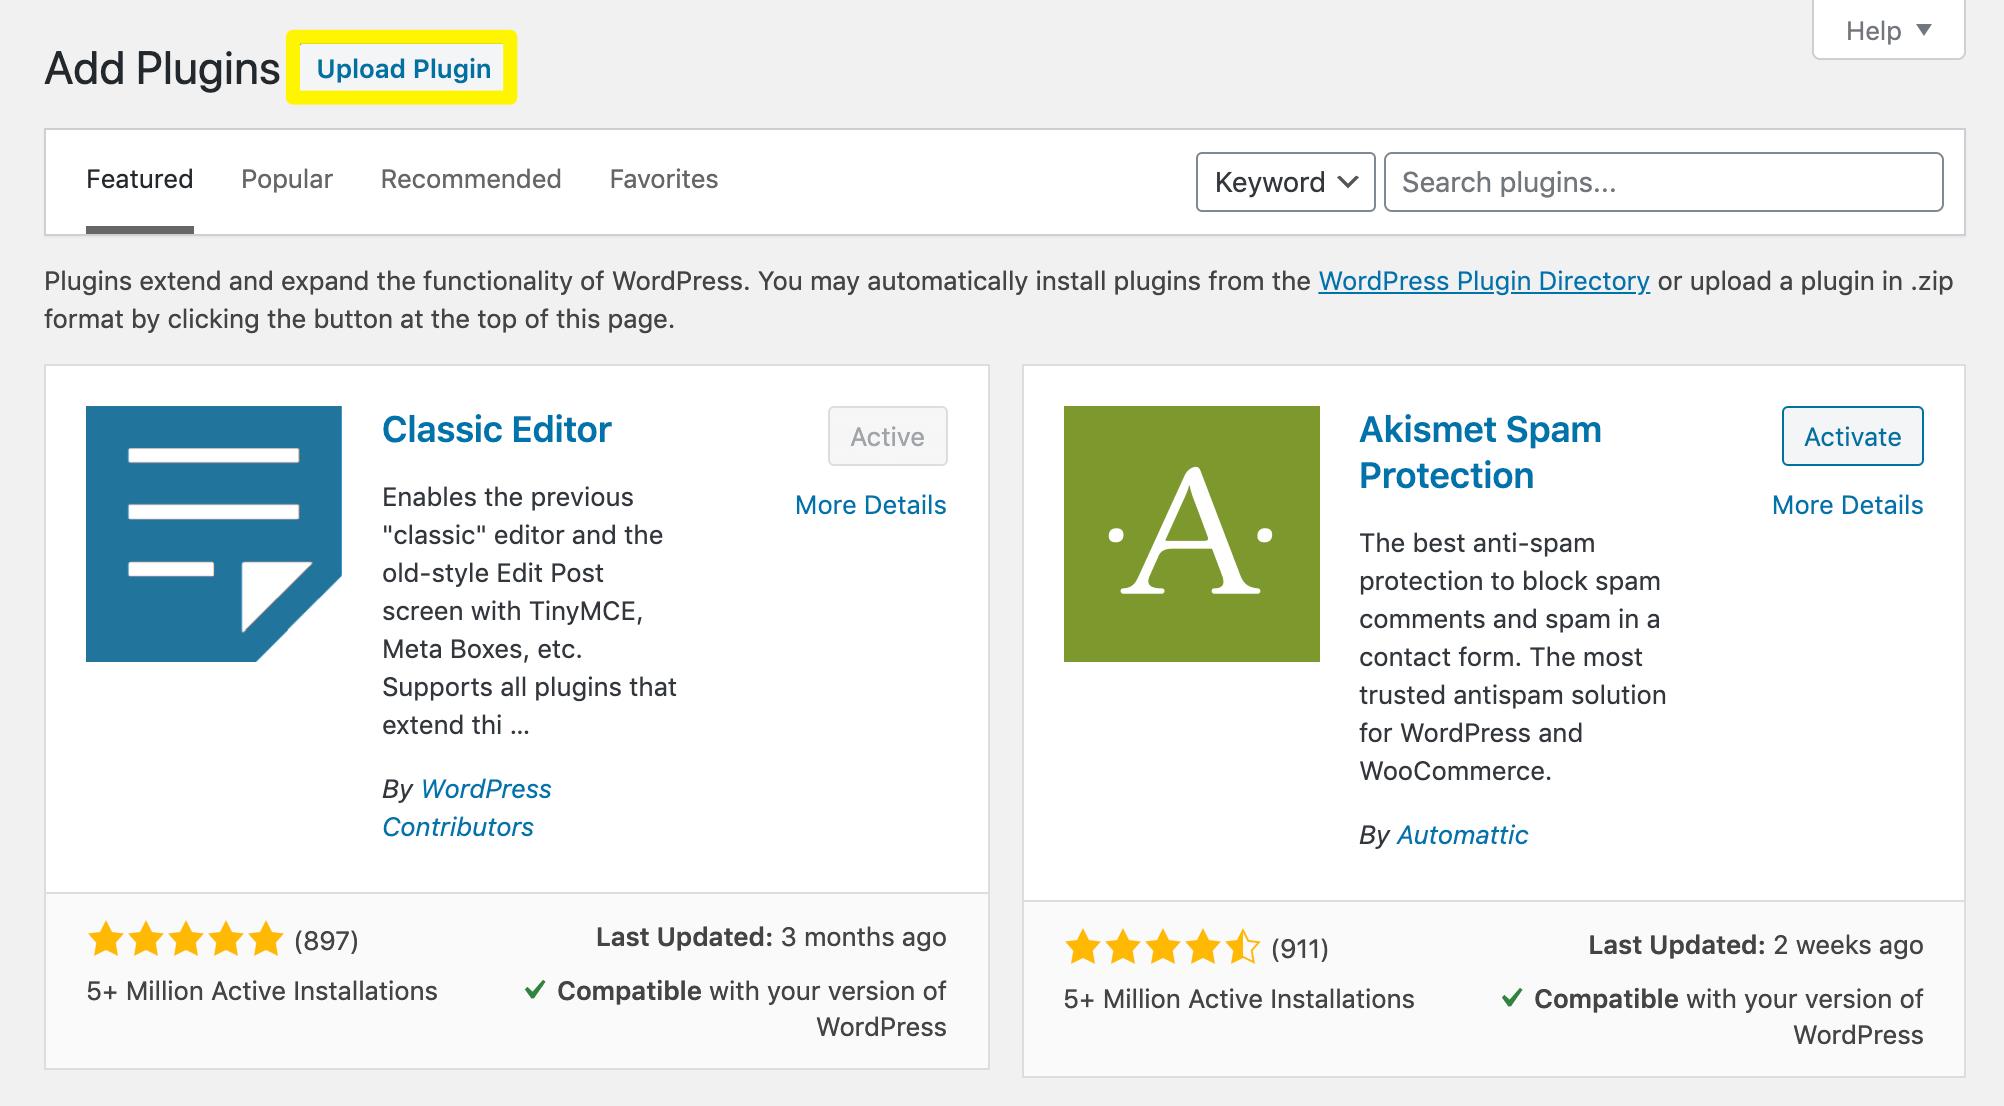 The Upload Plugin button in WordPress.